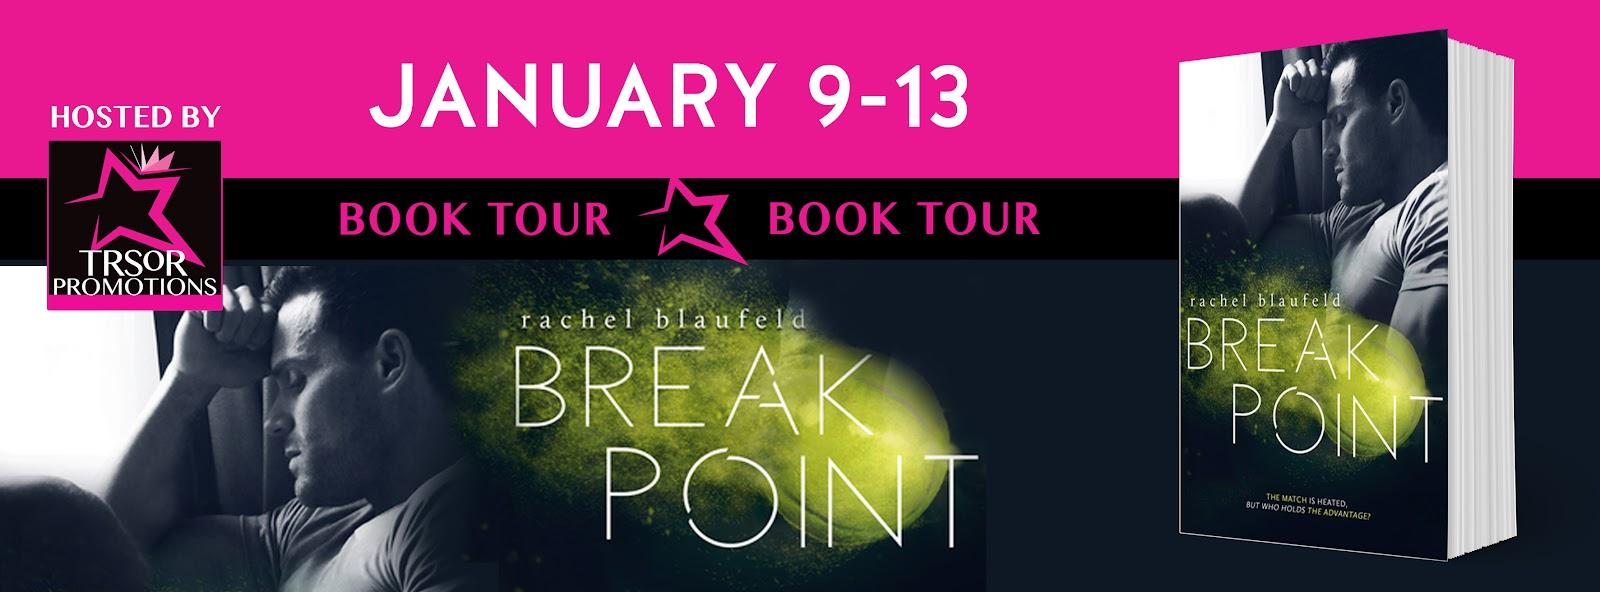 BREAK_POINT_BOOK_TOUR.jpg